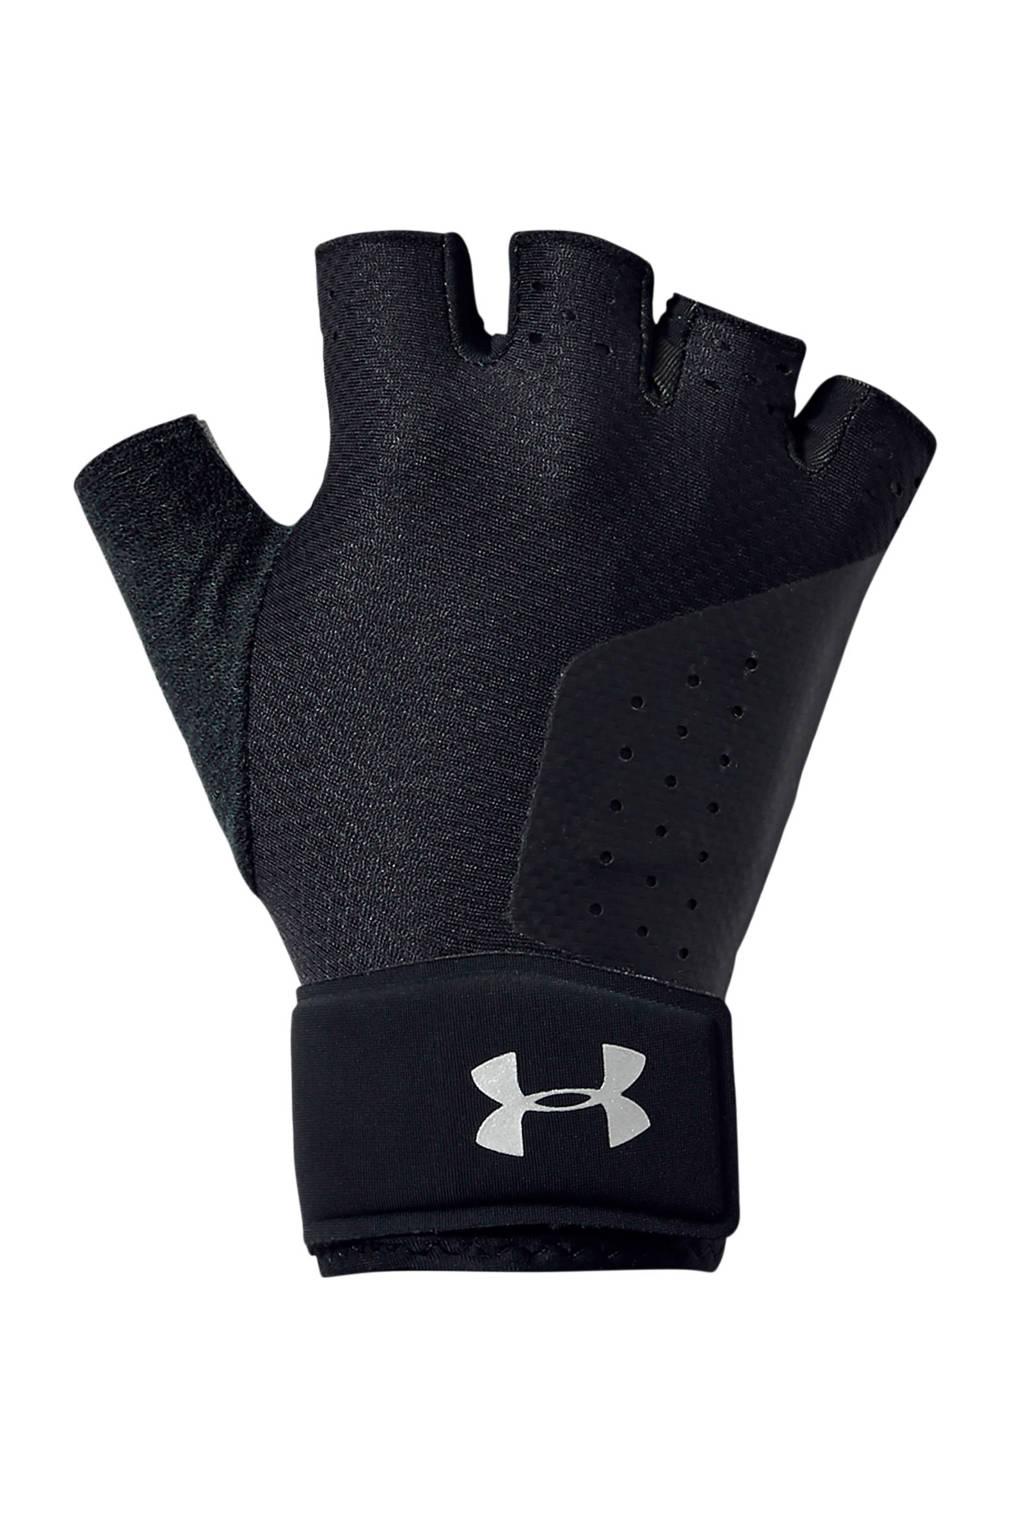 Under Armour   fitness handschoenen zwart, Zwart